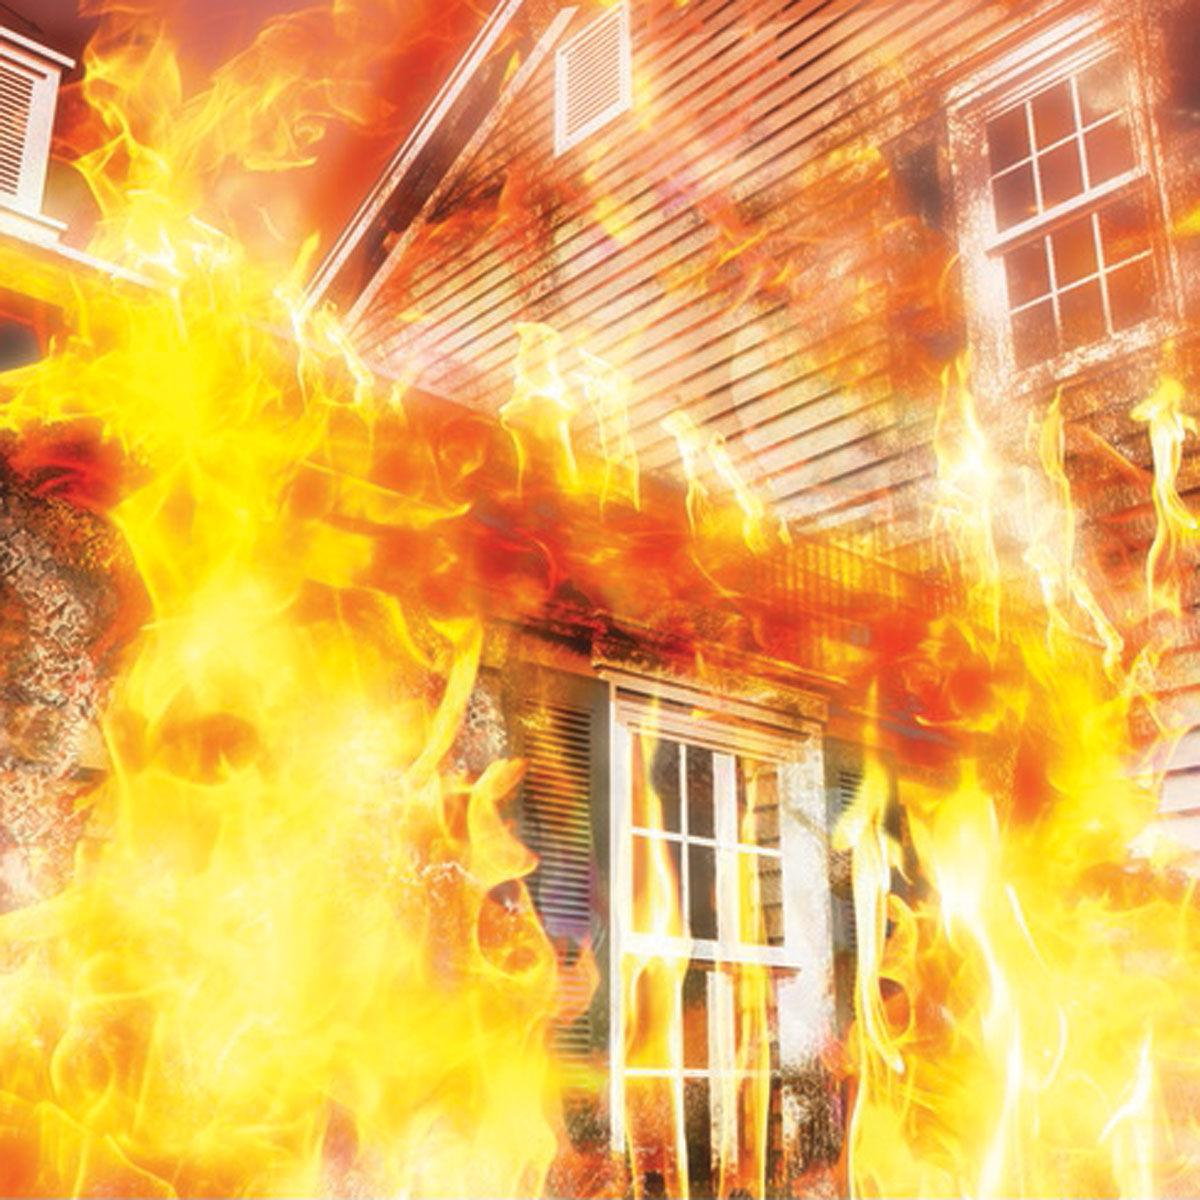 fire prevention essay contest